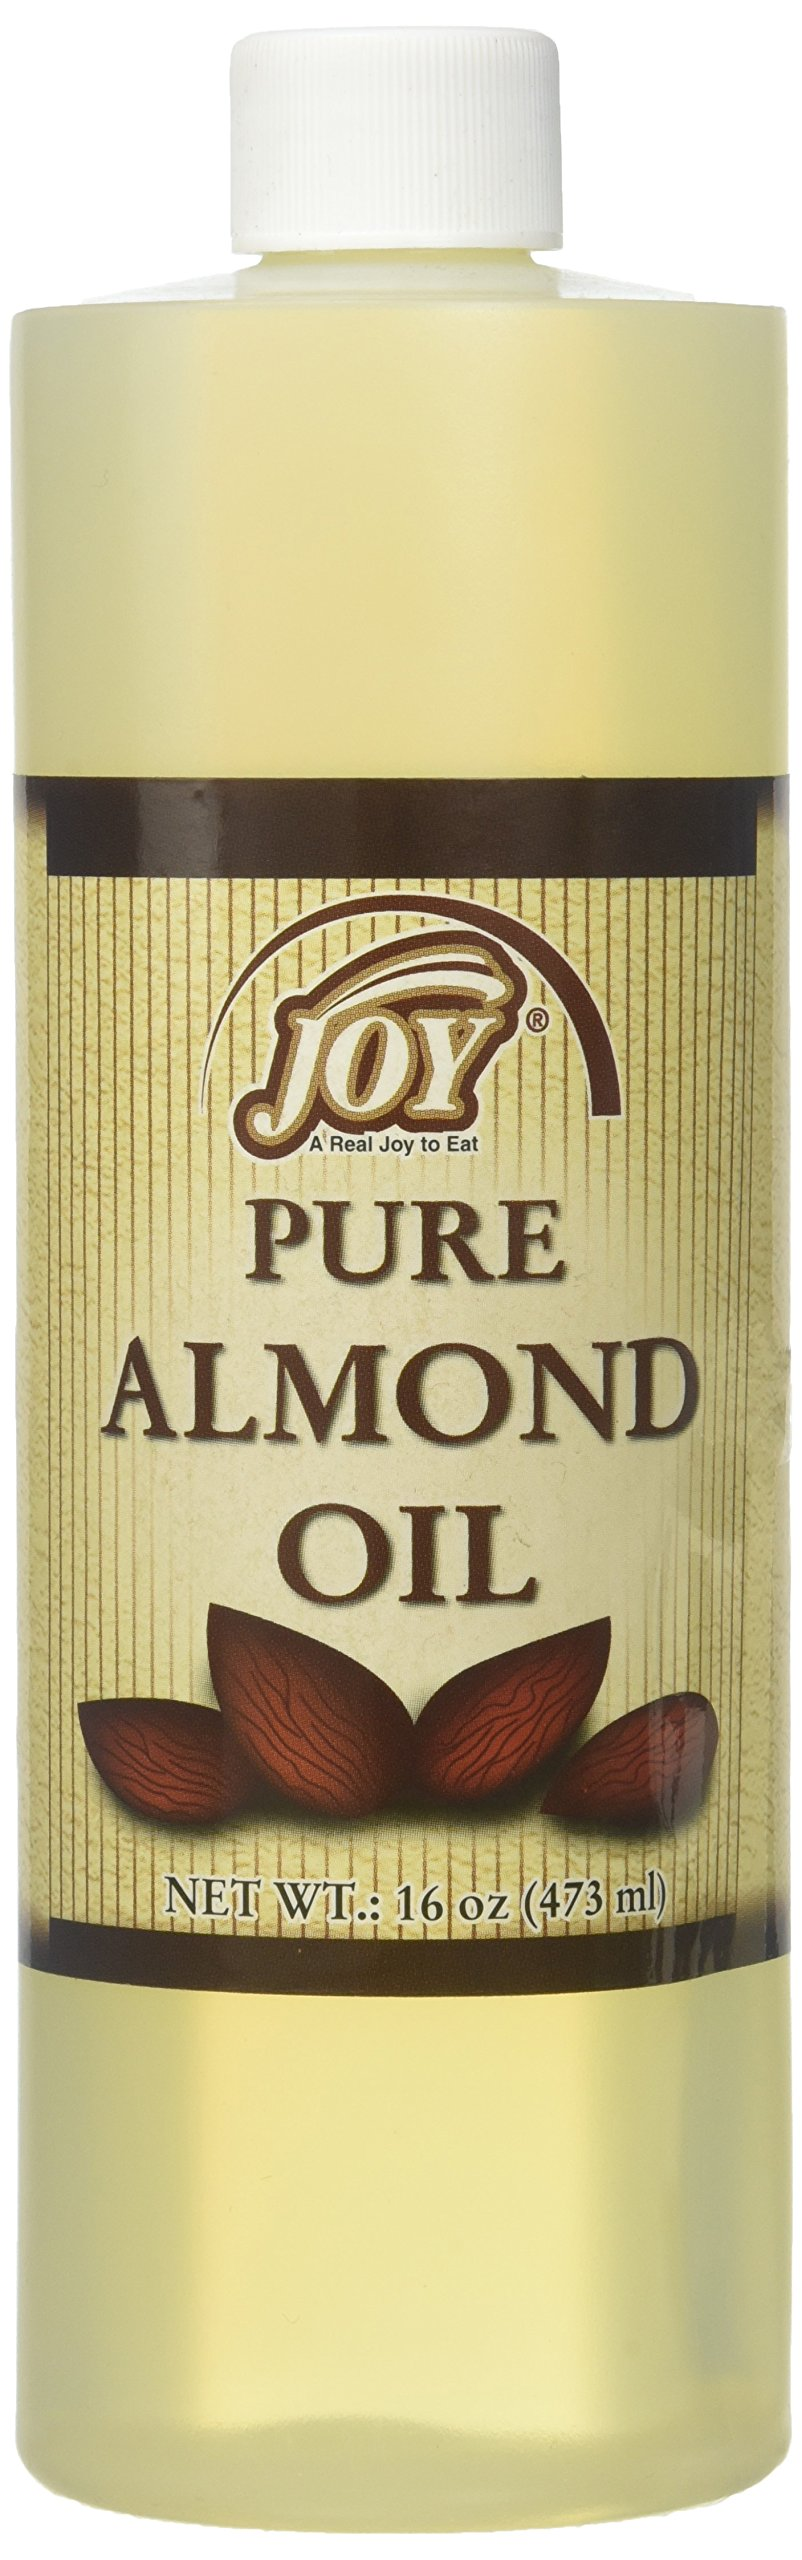 Joy Pure Almond Oil 16 Oz